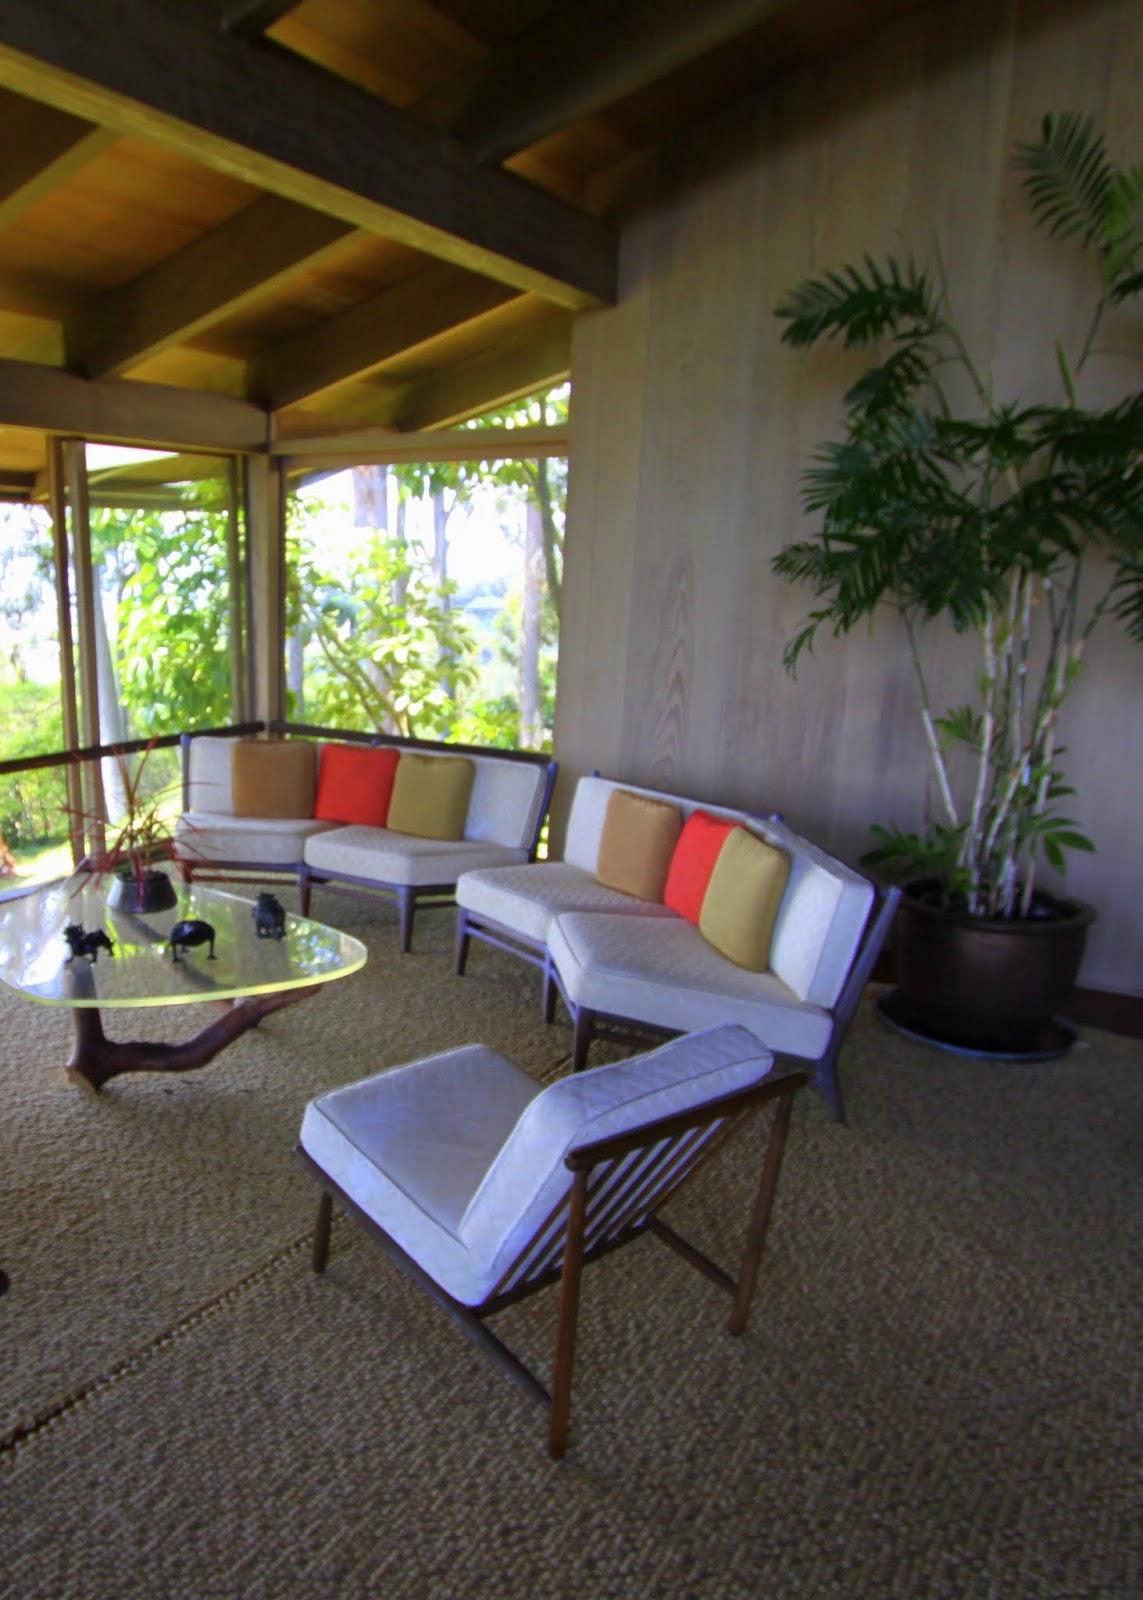 Modern Furniture Hawaii the liljestrand houseossipoff: hawaiian modern magnificence